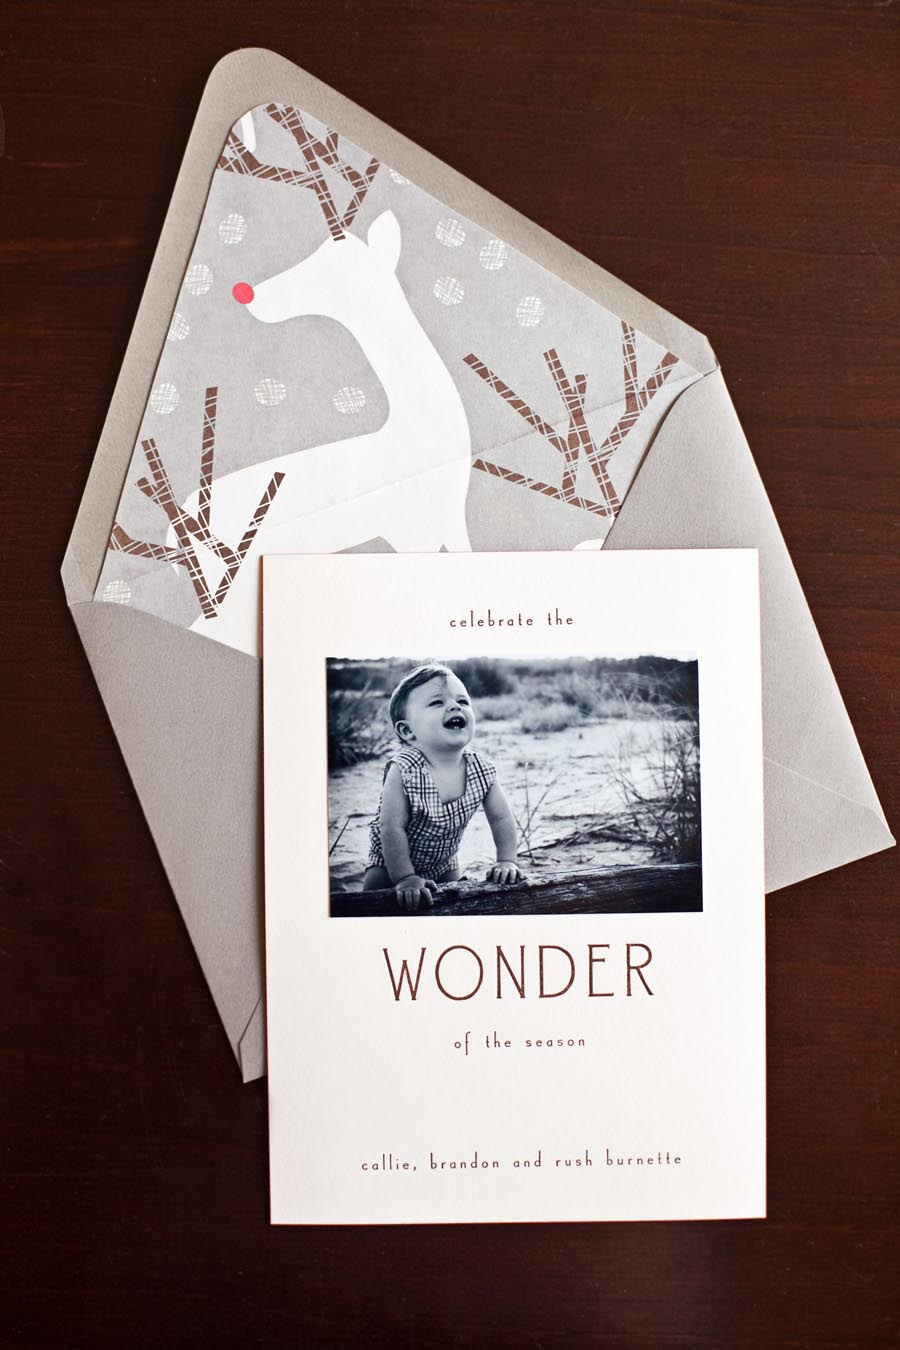 the-wonder-of-the-season-2